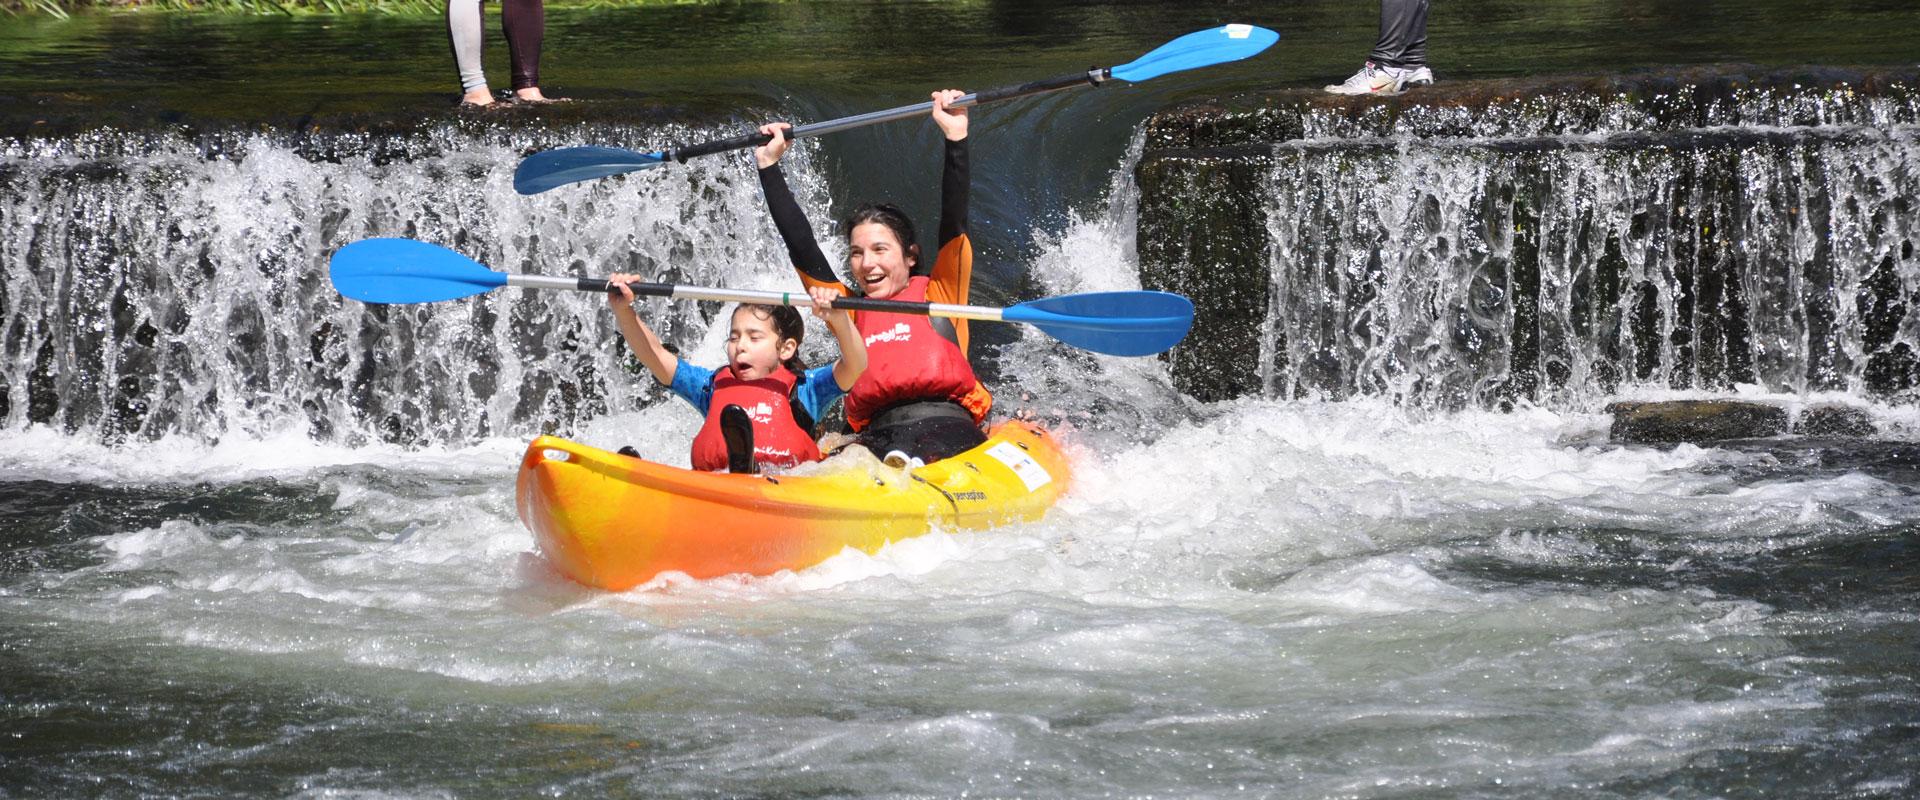 Descenso Río Umia en Kayak